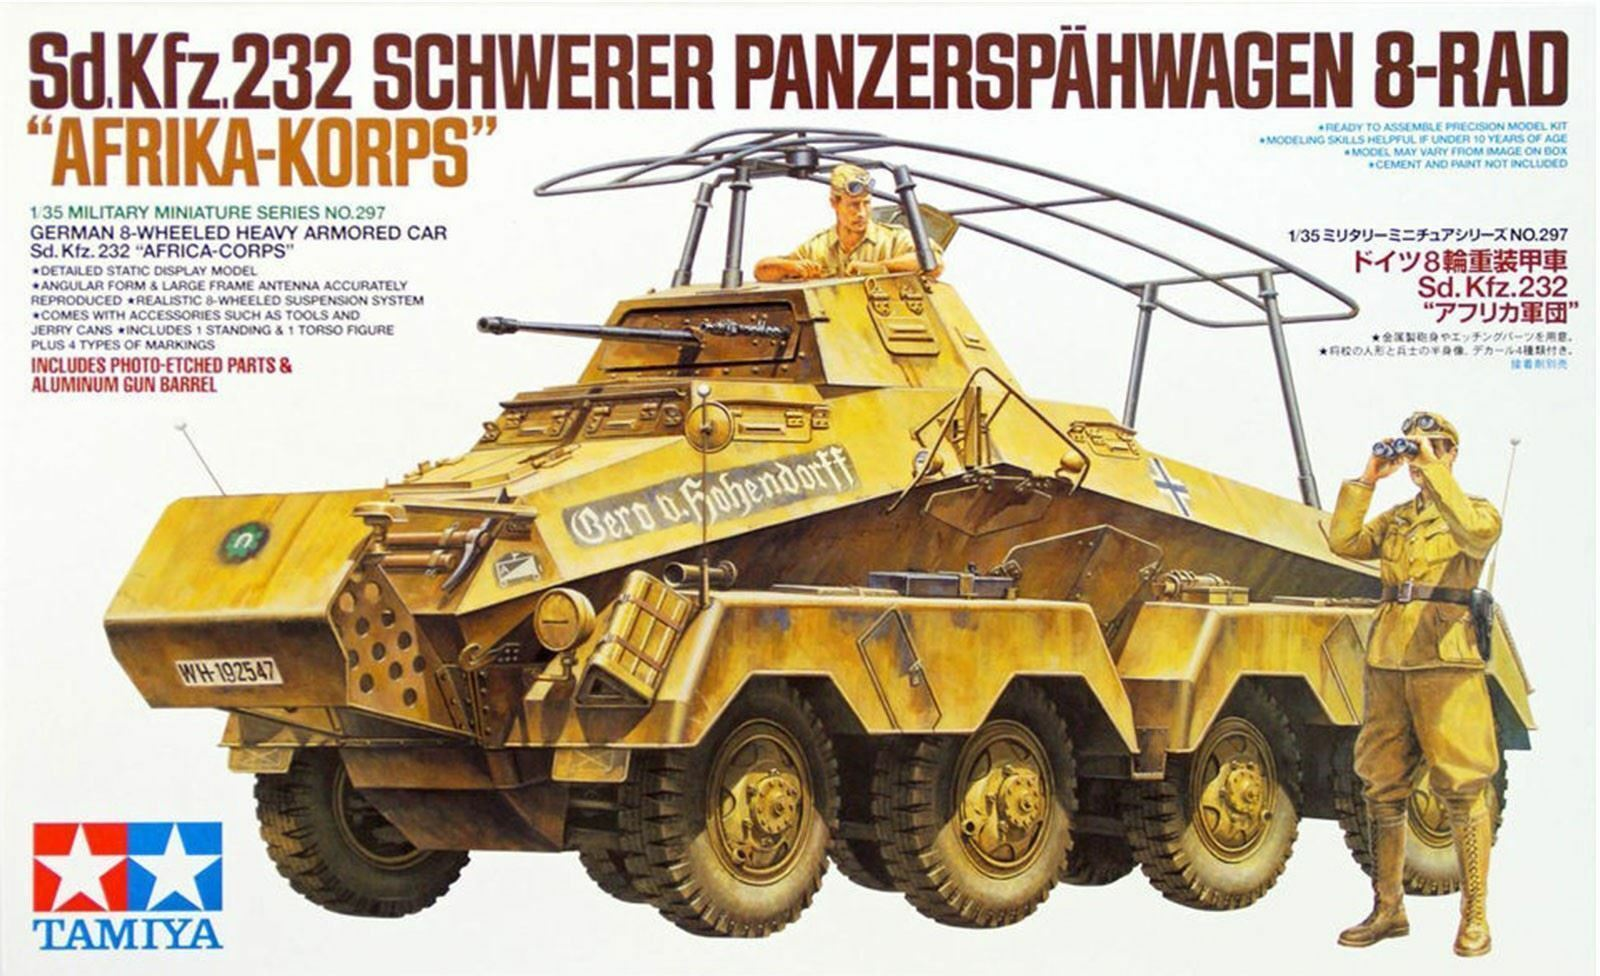 Sd.Kfz.232 Africa Corps 1 35 Military Model Kit Tamiya 35297